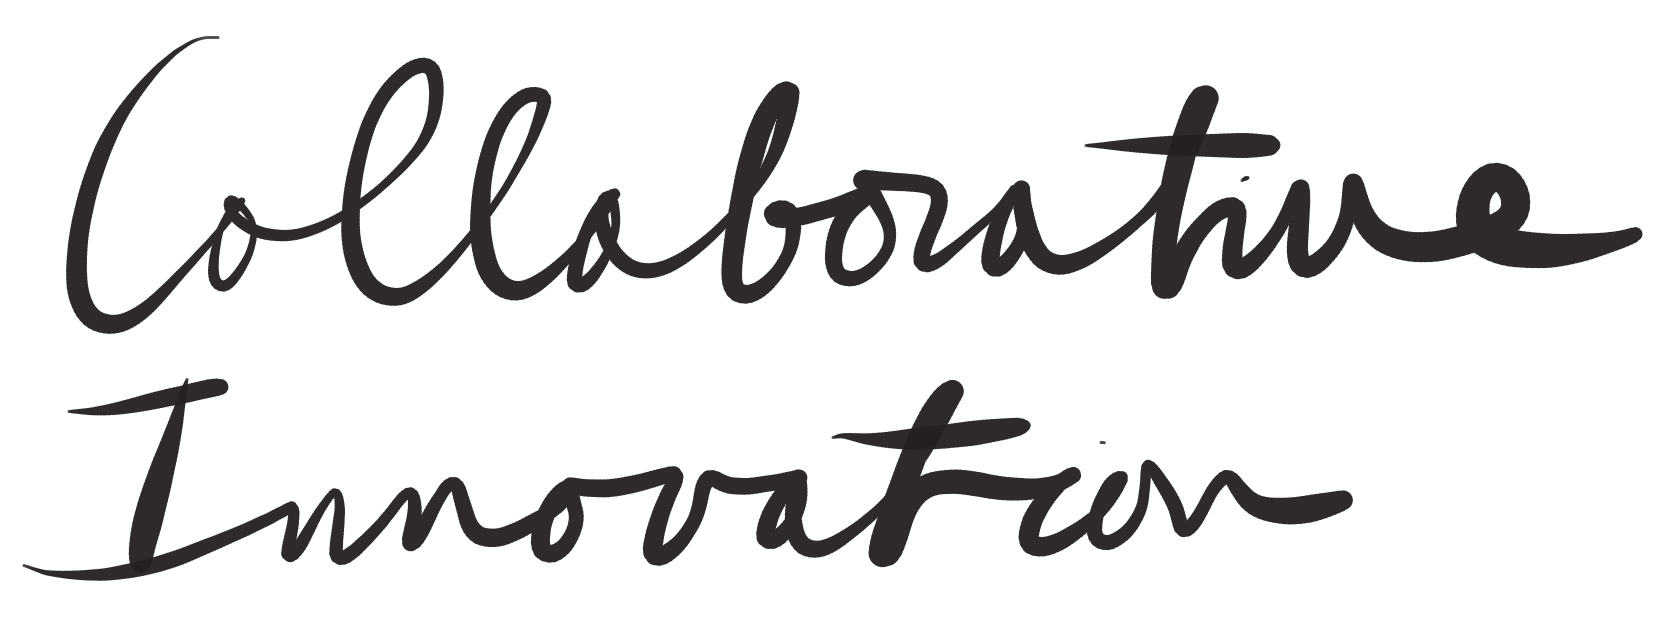 collaborative-innovation